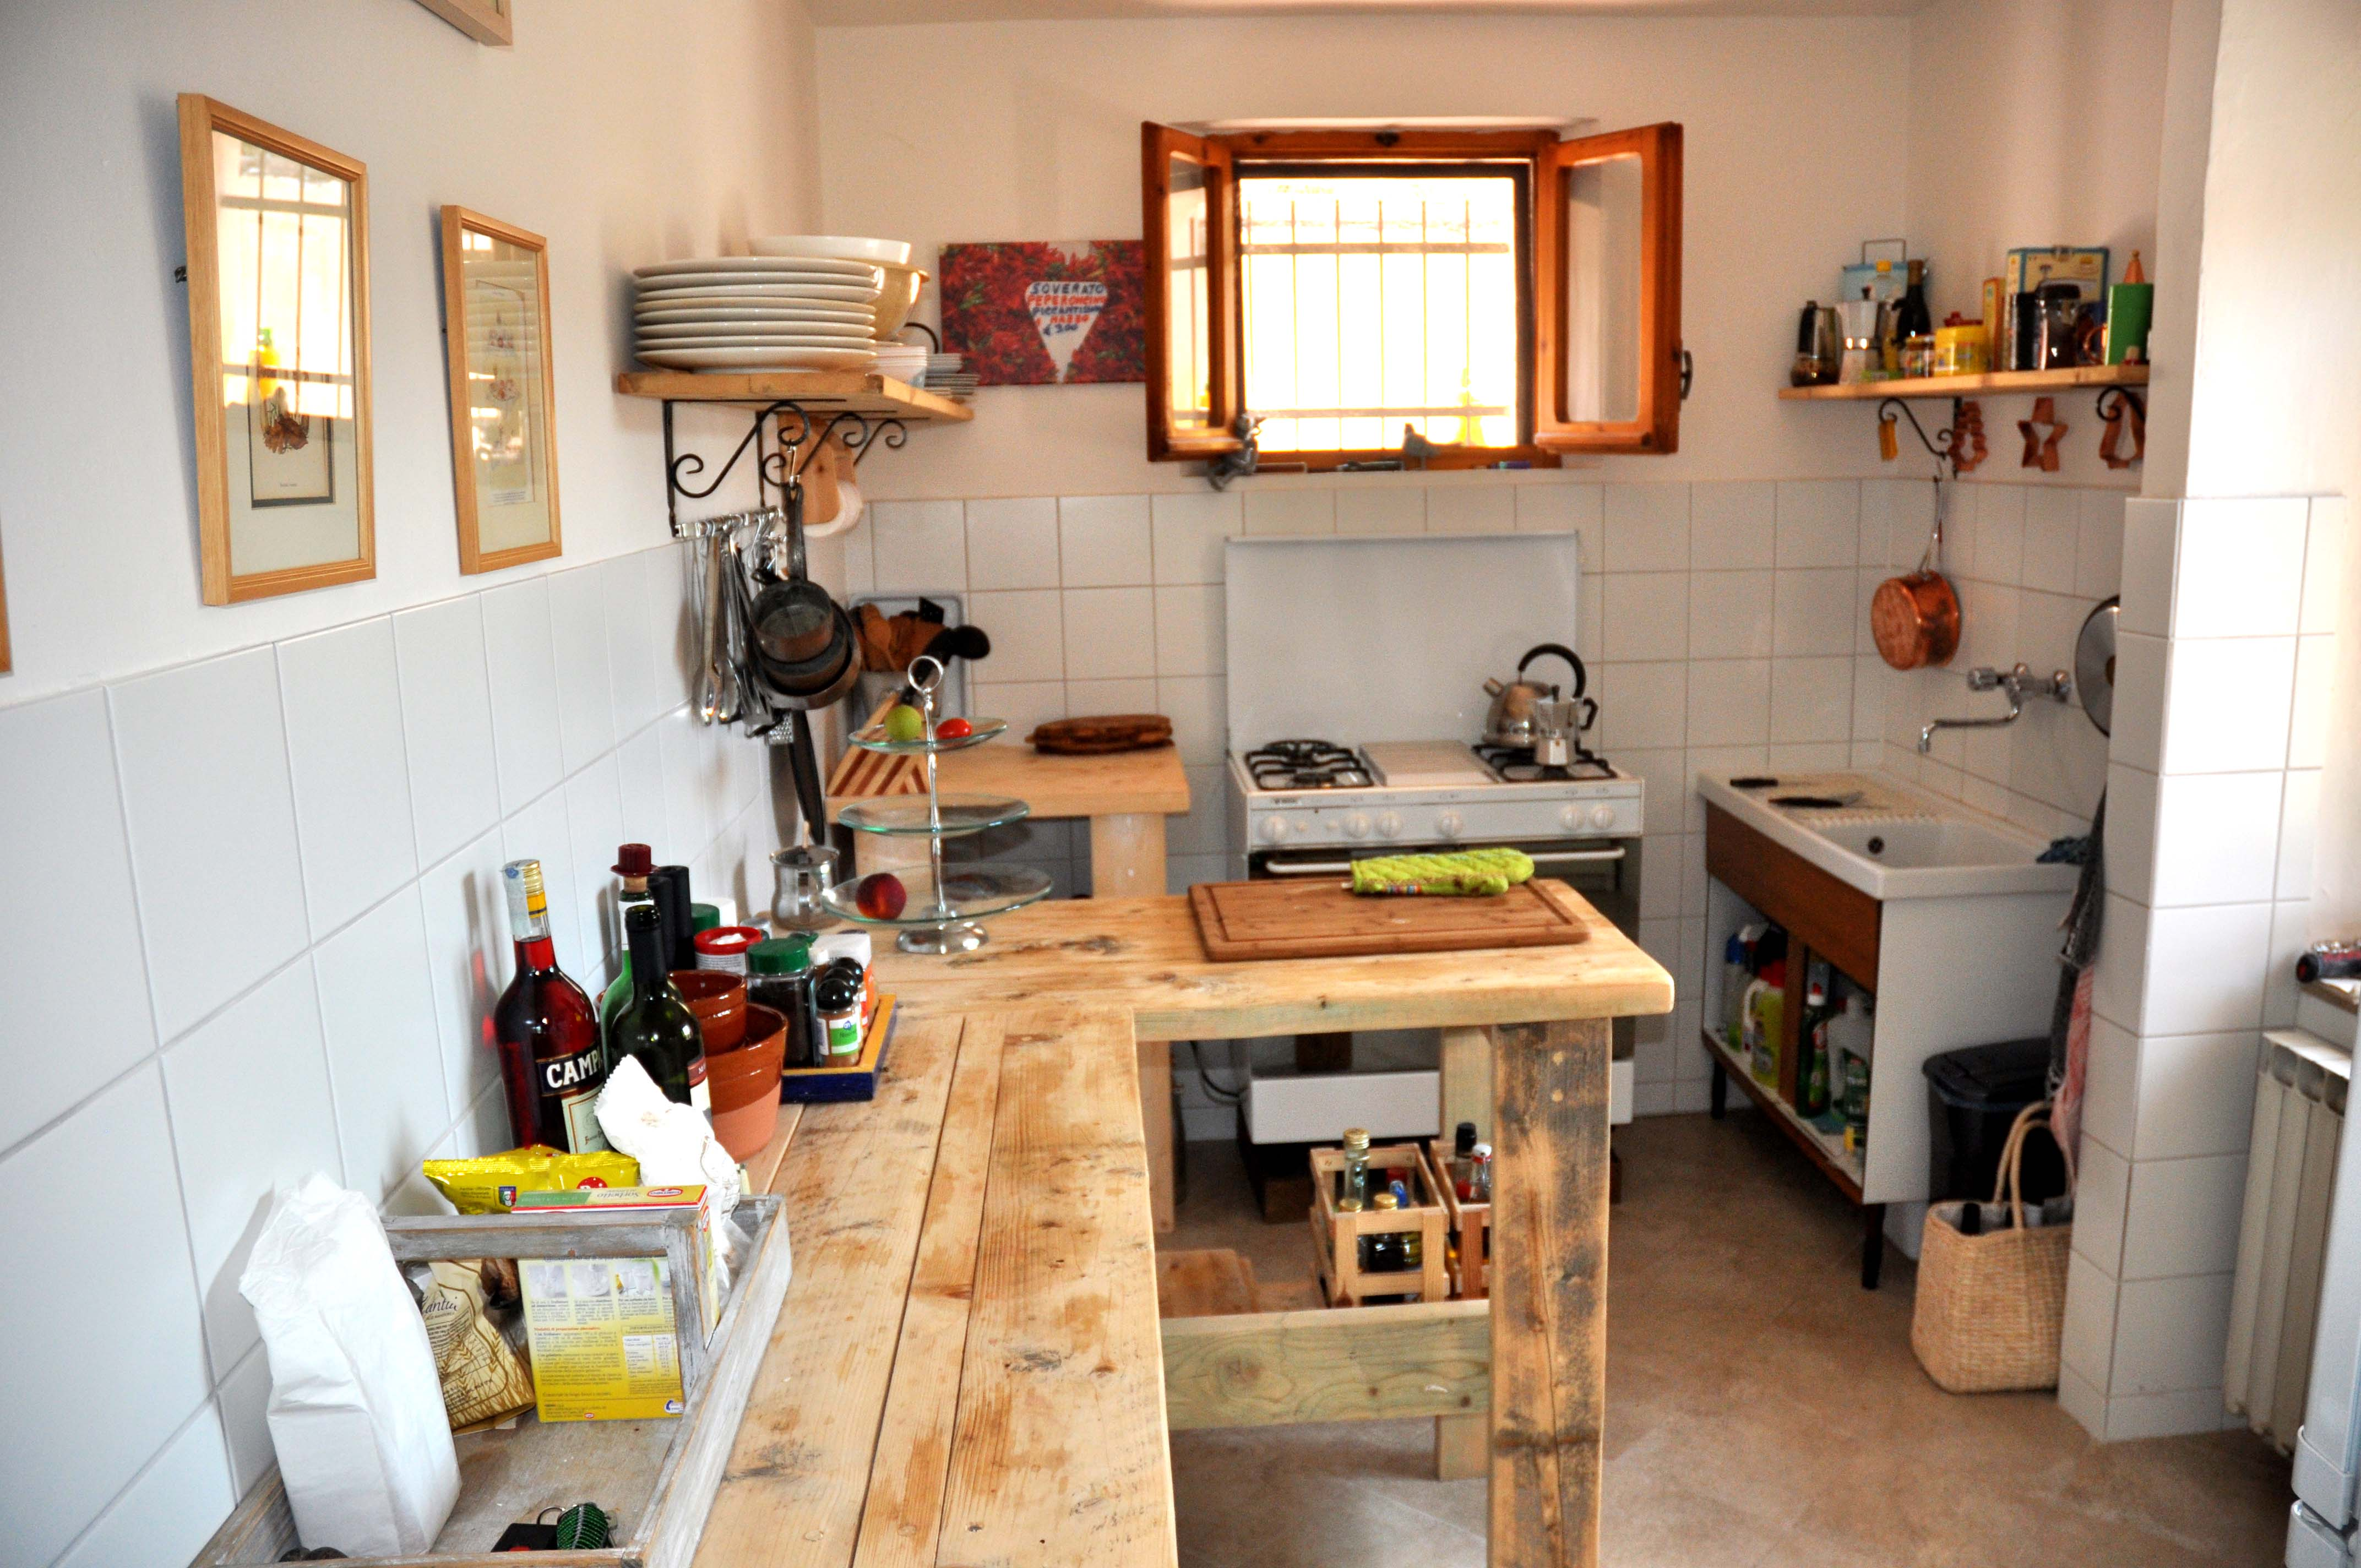 Vakantiehuis pergola het huis vakantiehuis pergola - Balances ingerichte keukens ...